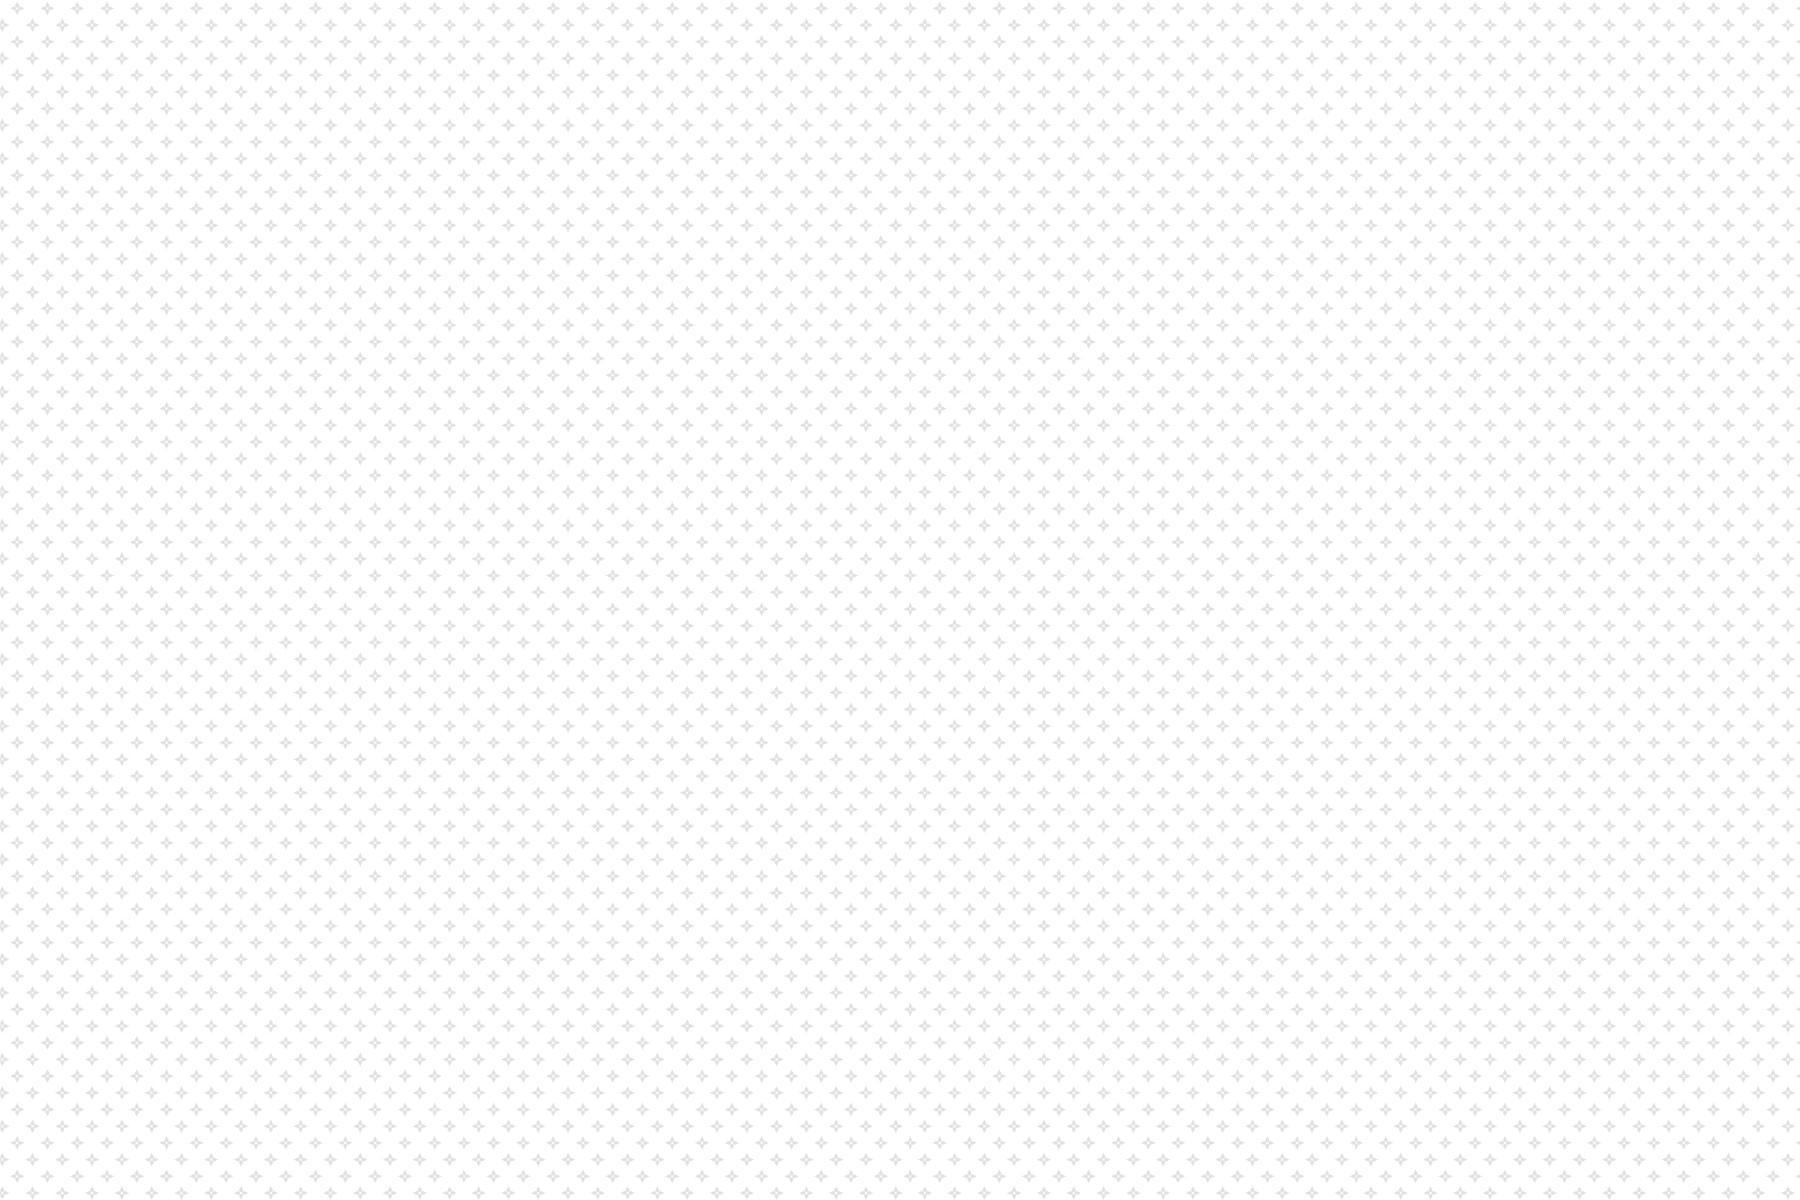 GFT SPB Floral Grid White